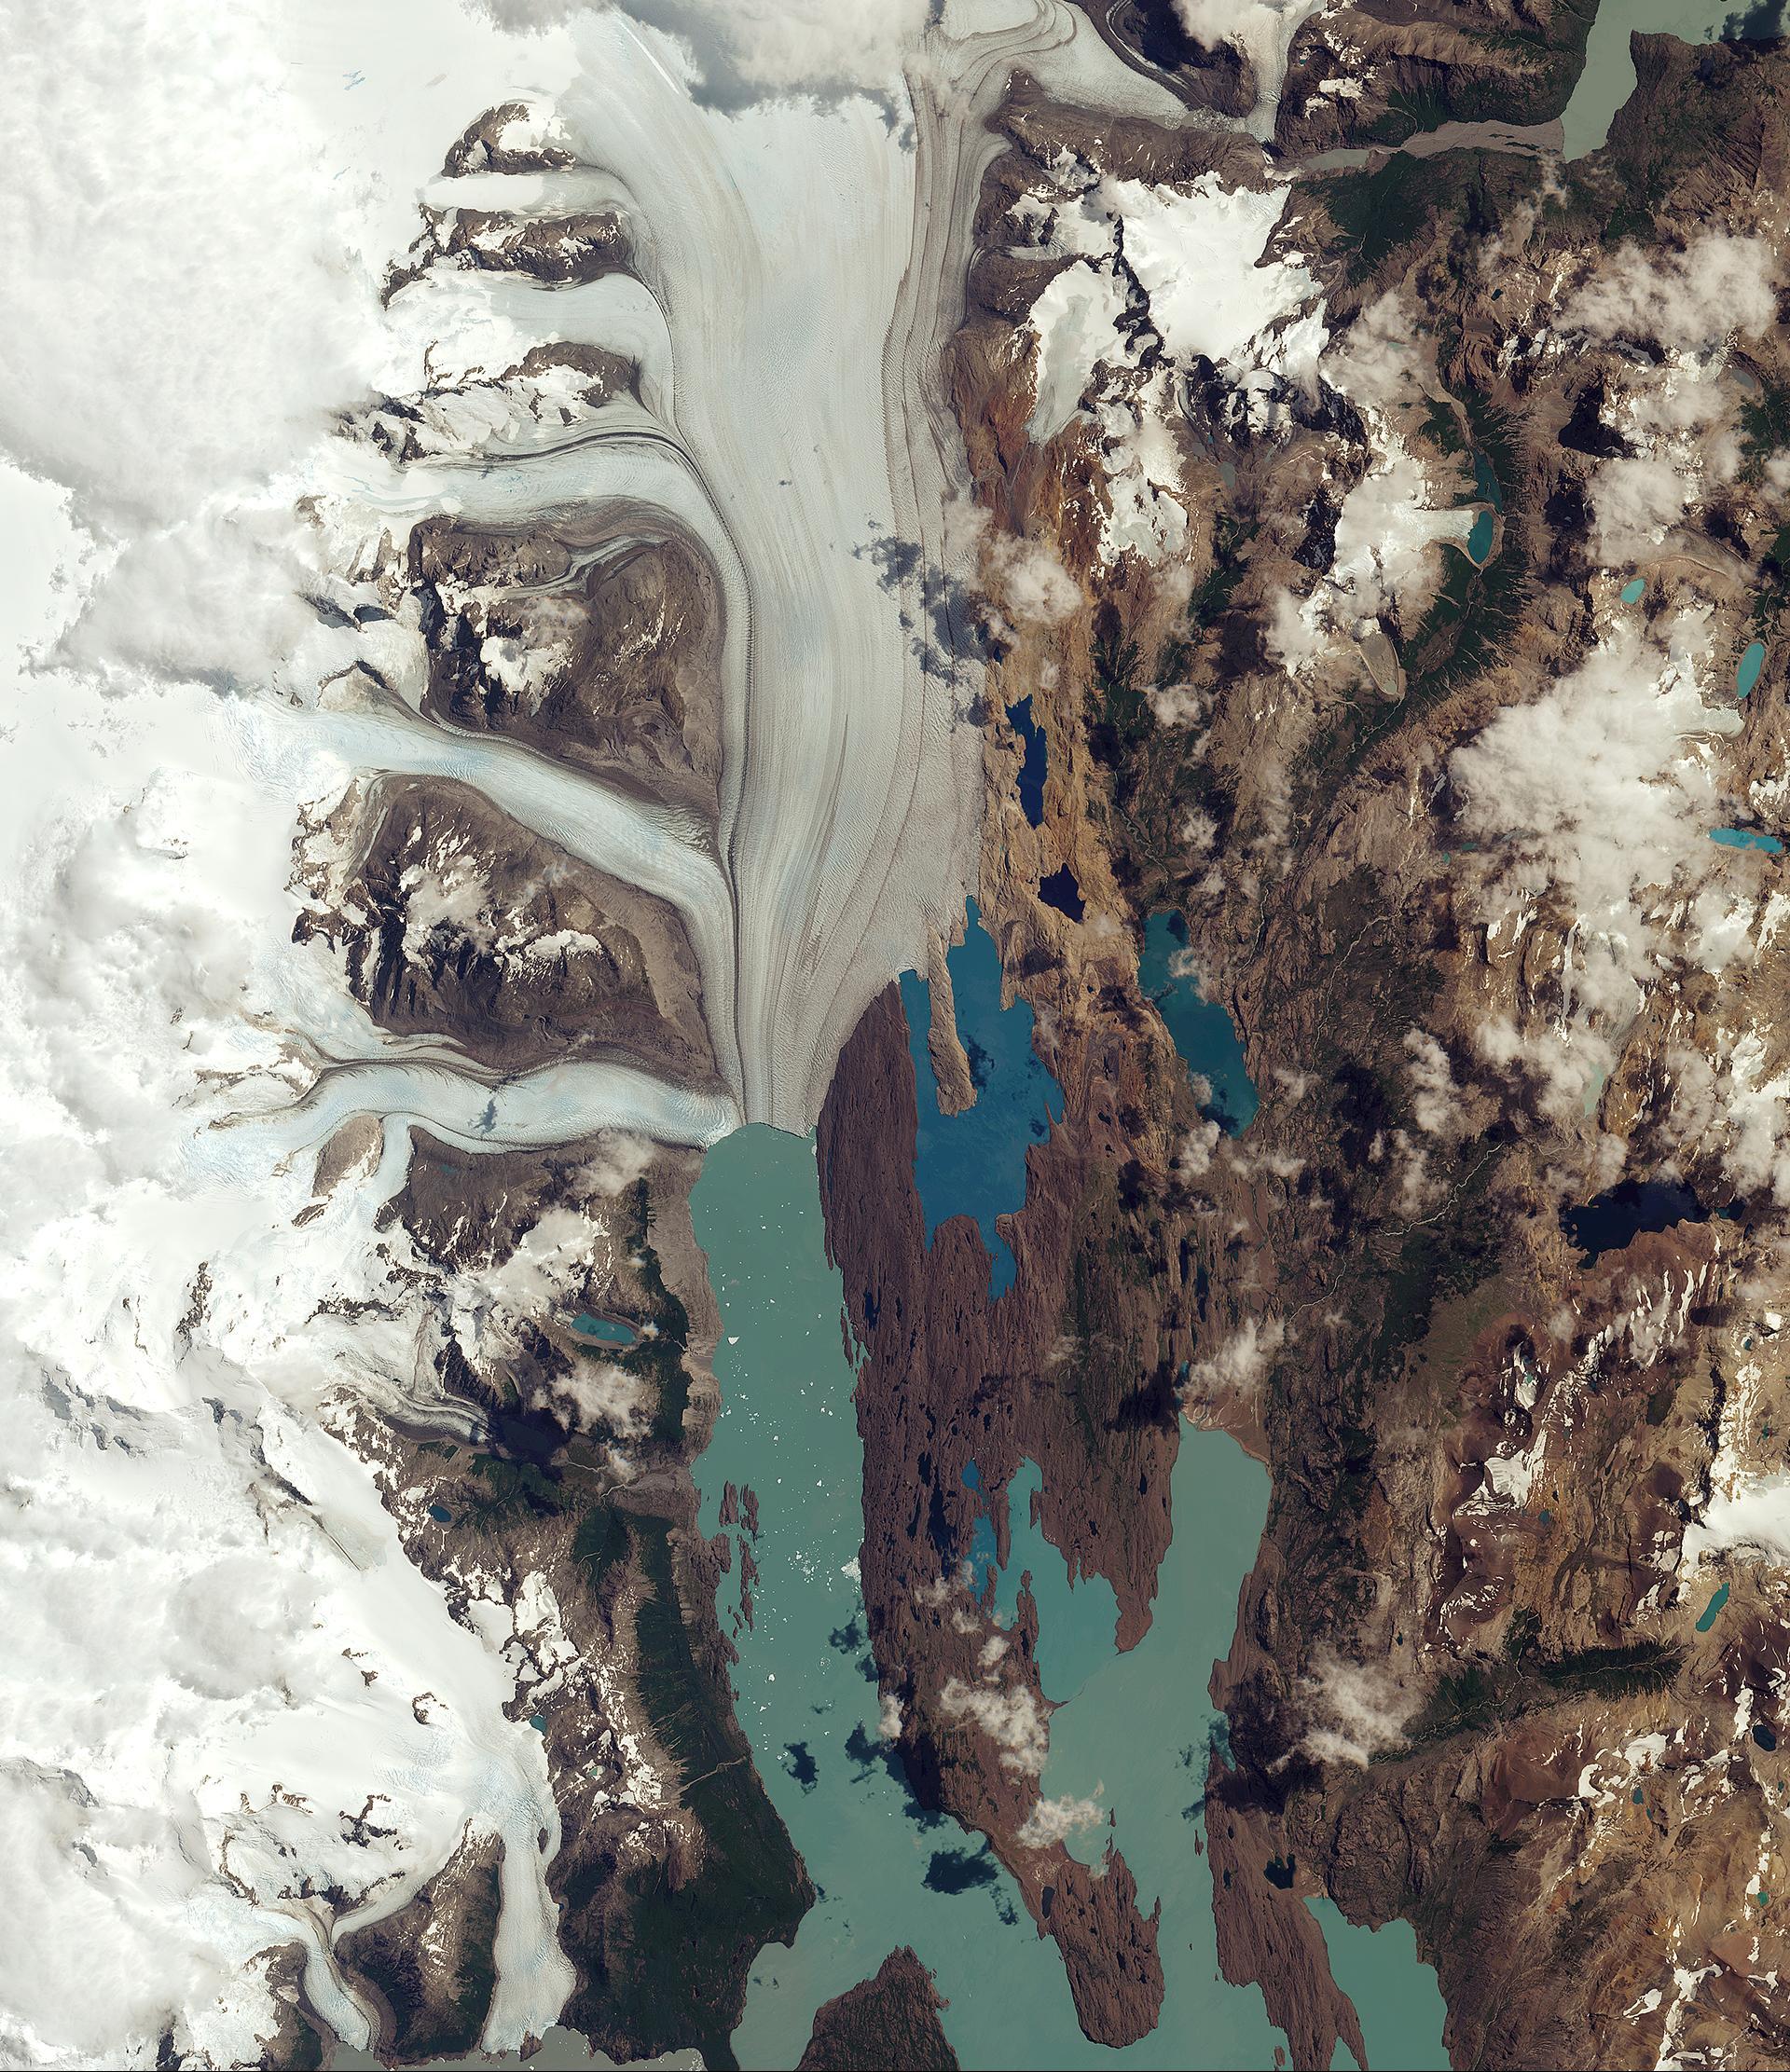 upsala_glacier.jpg